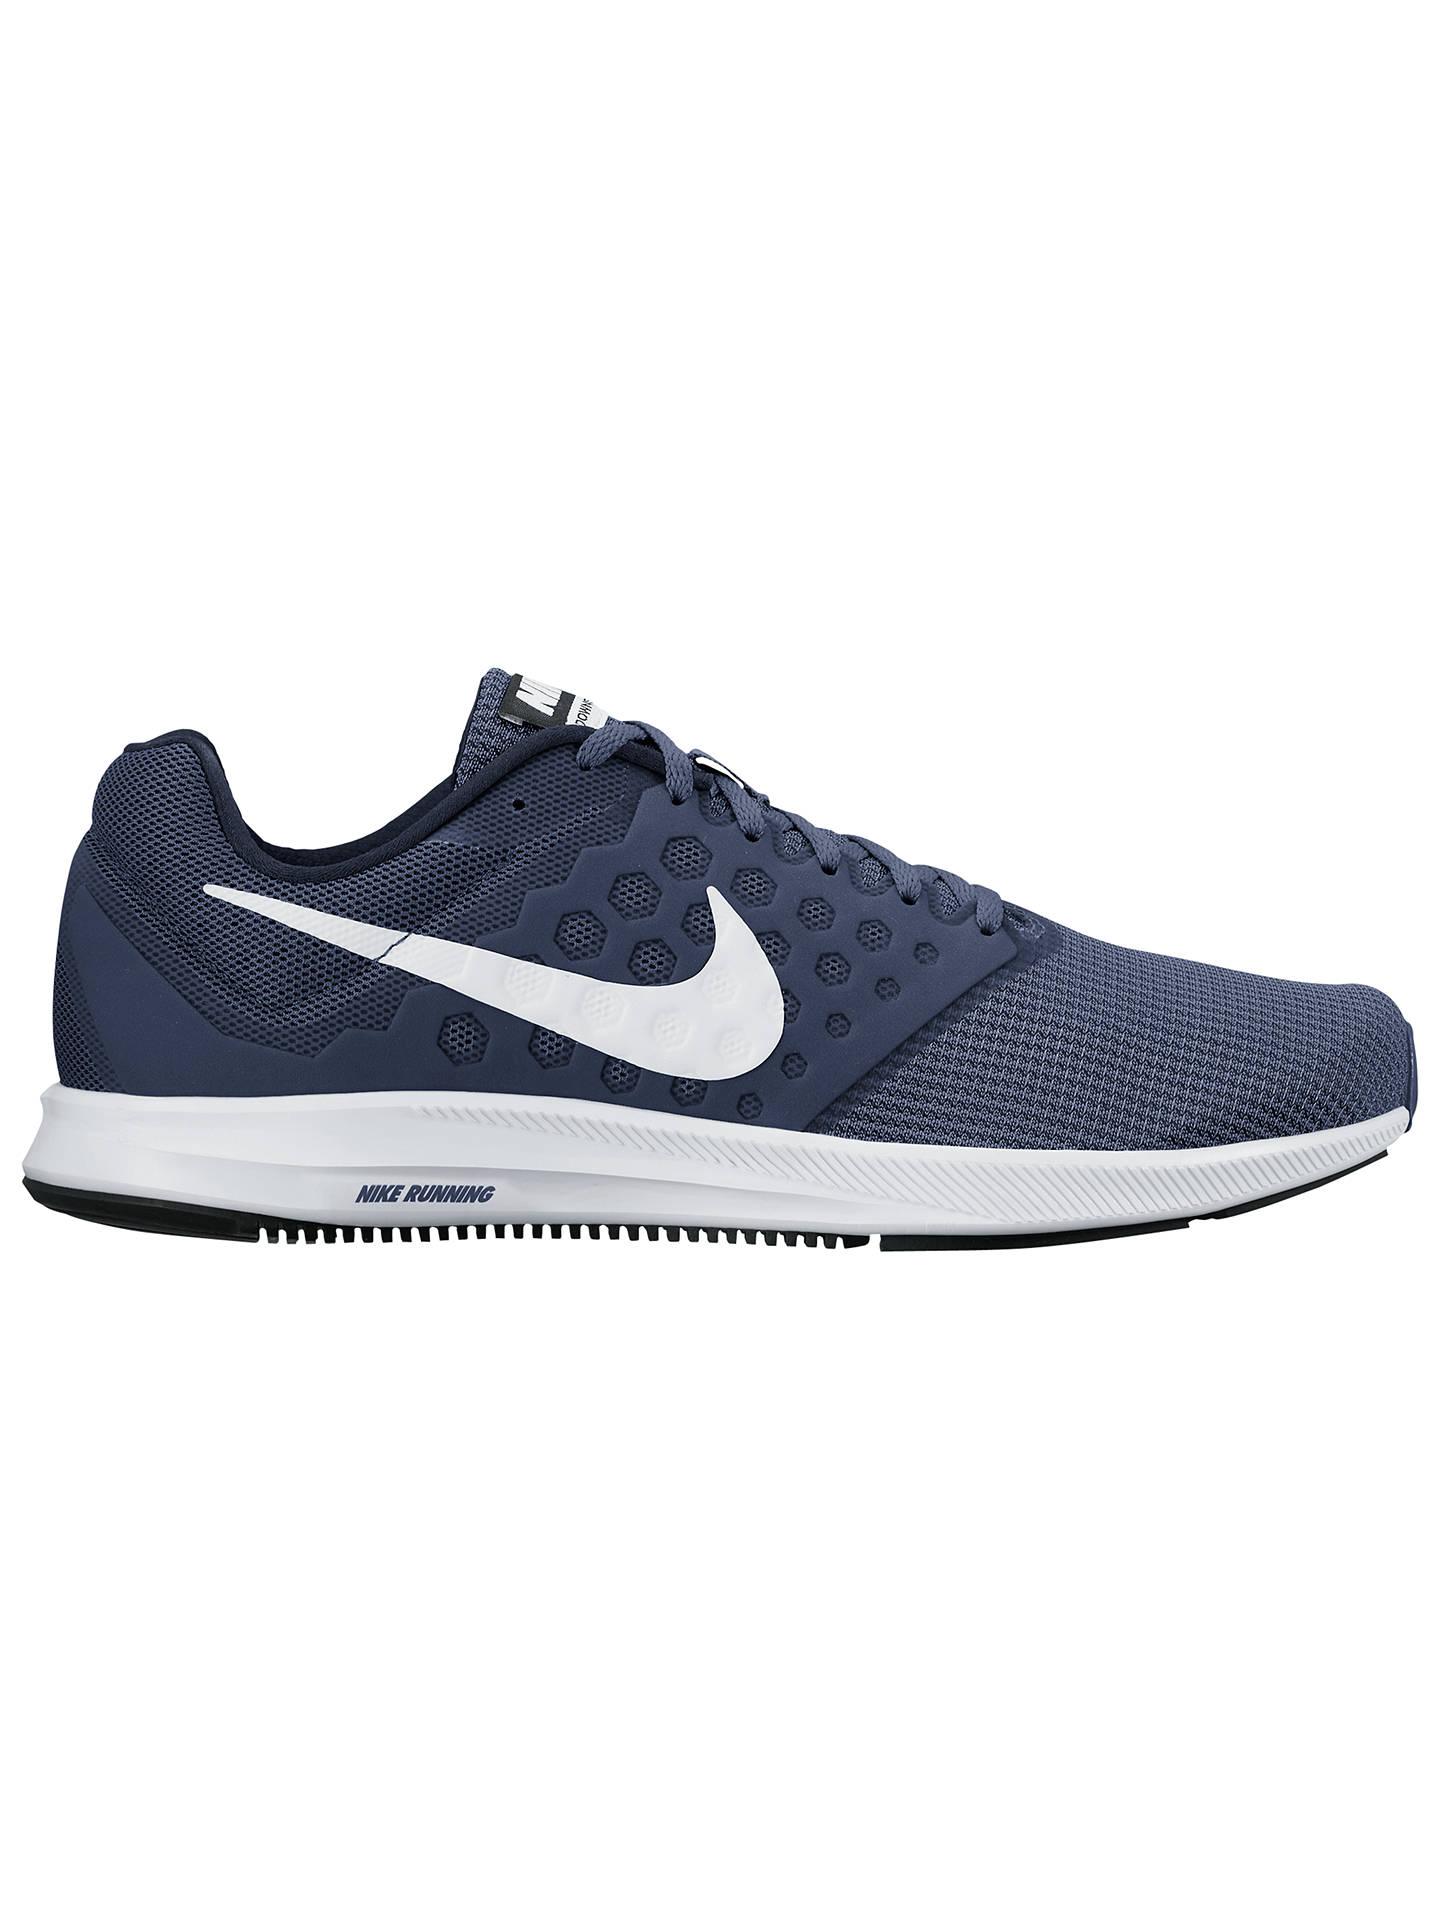 d993a0ca90881 Buy Nike Downshifter 7 Men s Running Shoes